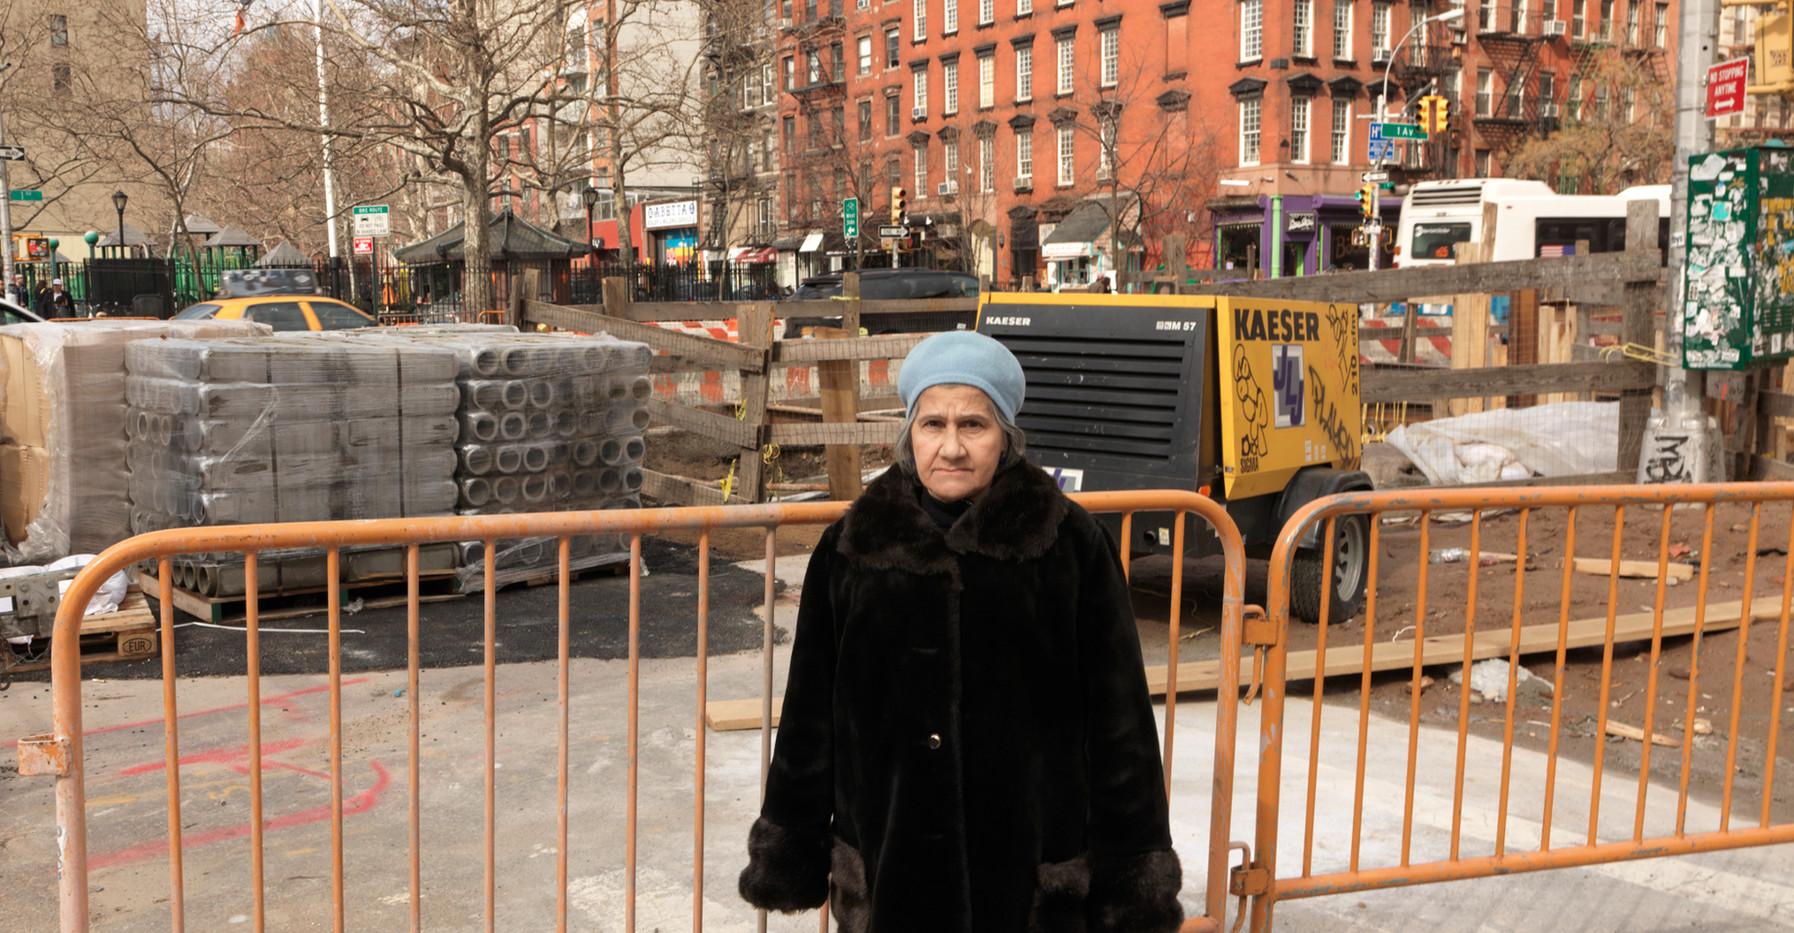 NYC-2013-Sun24_2753_prv.jpg